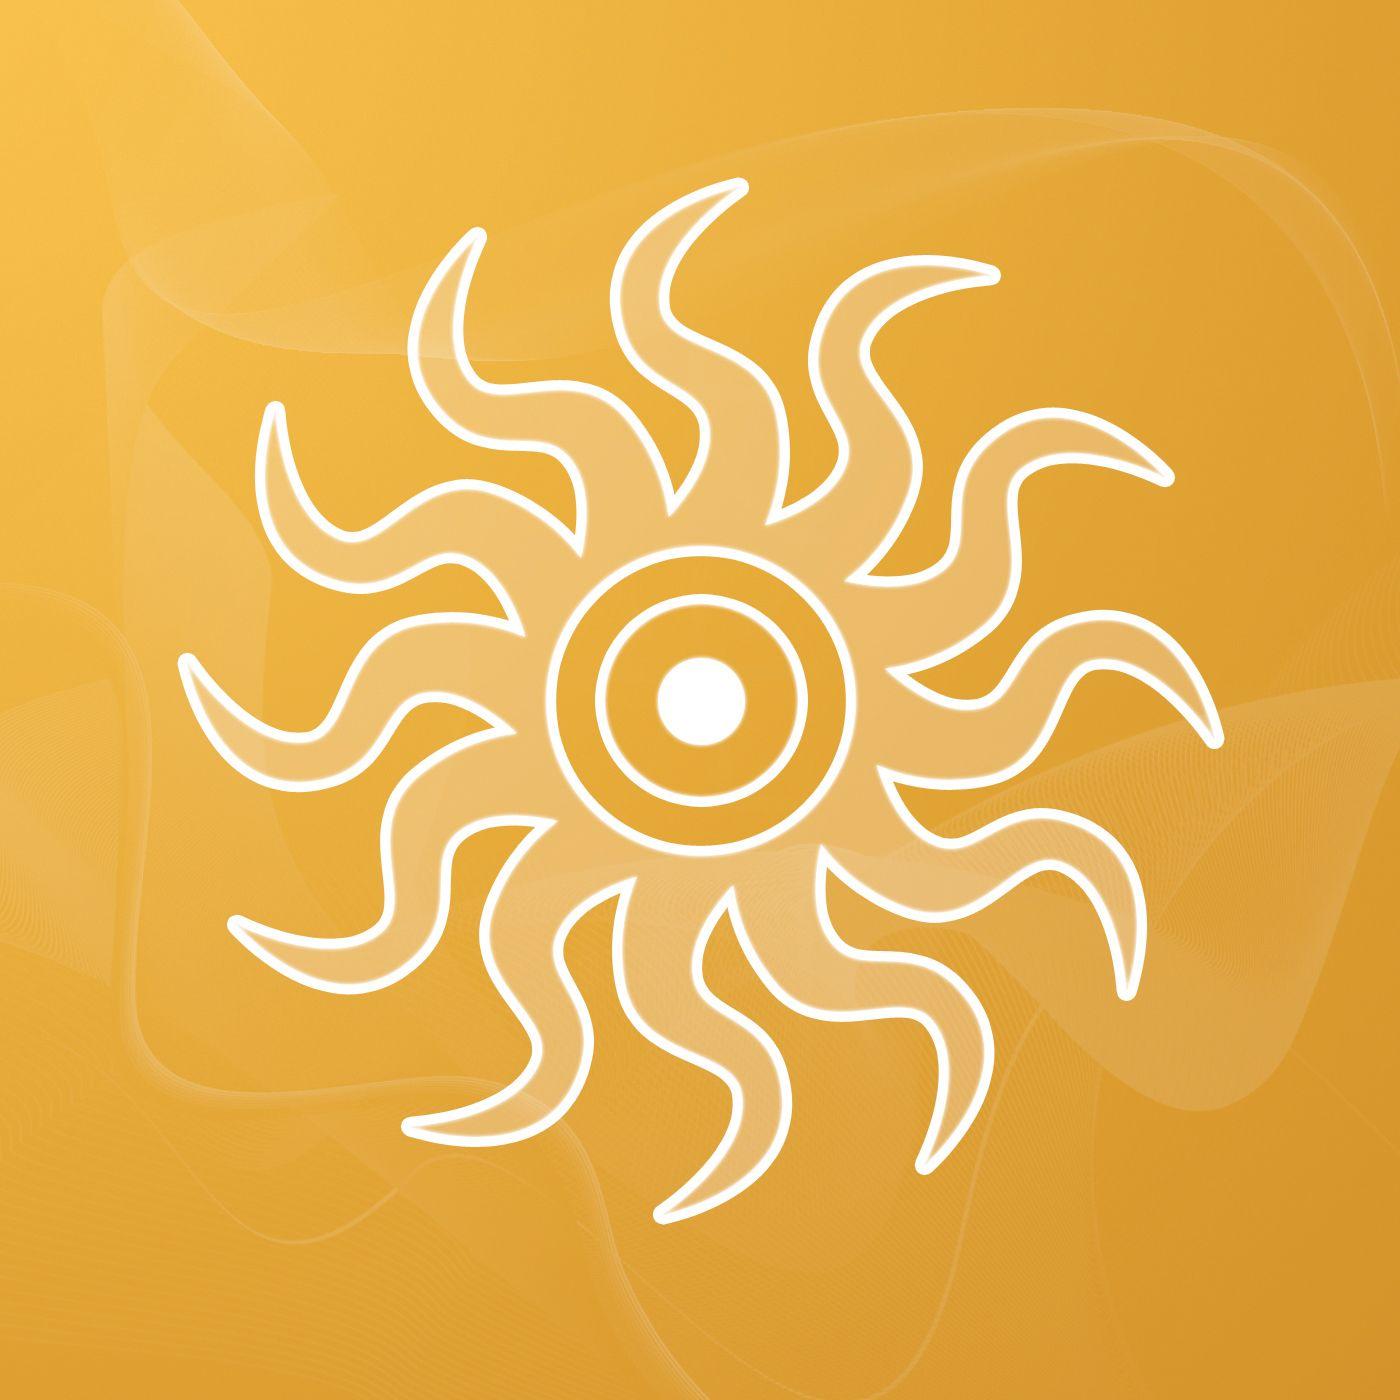 Sigils Symbols Sun Salutation By Sallie M Keys This Image